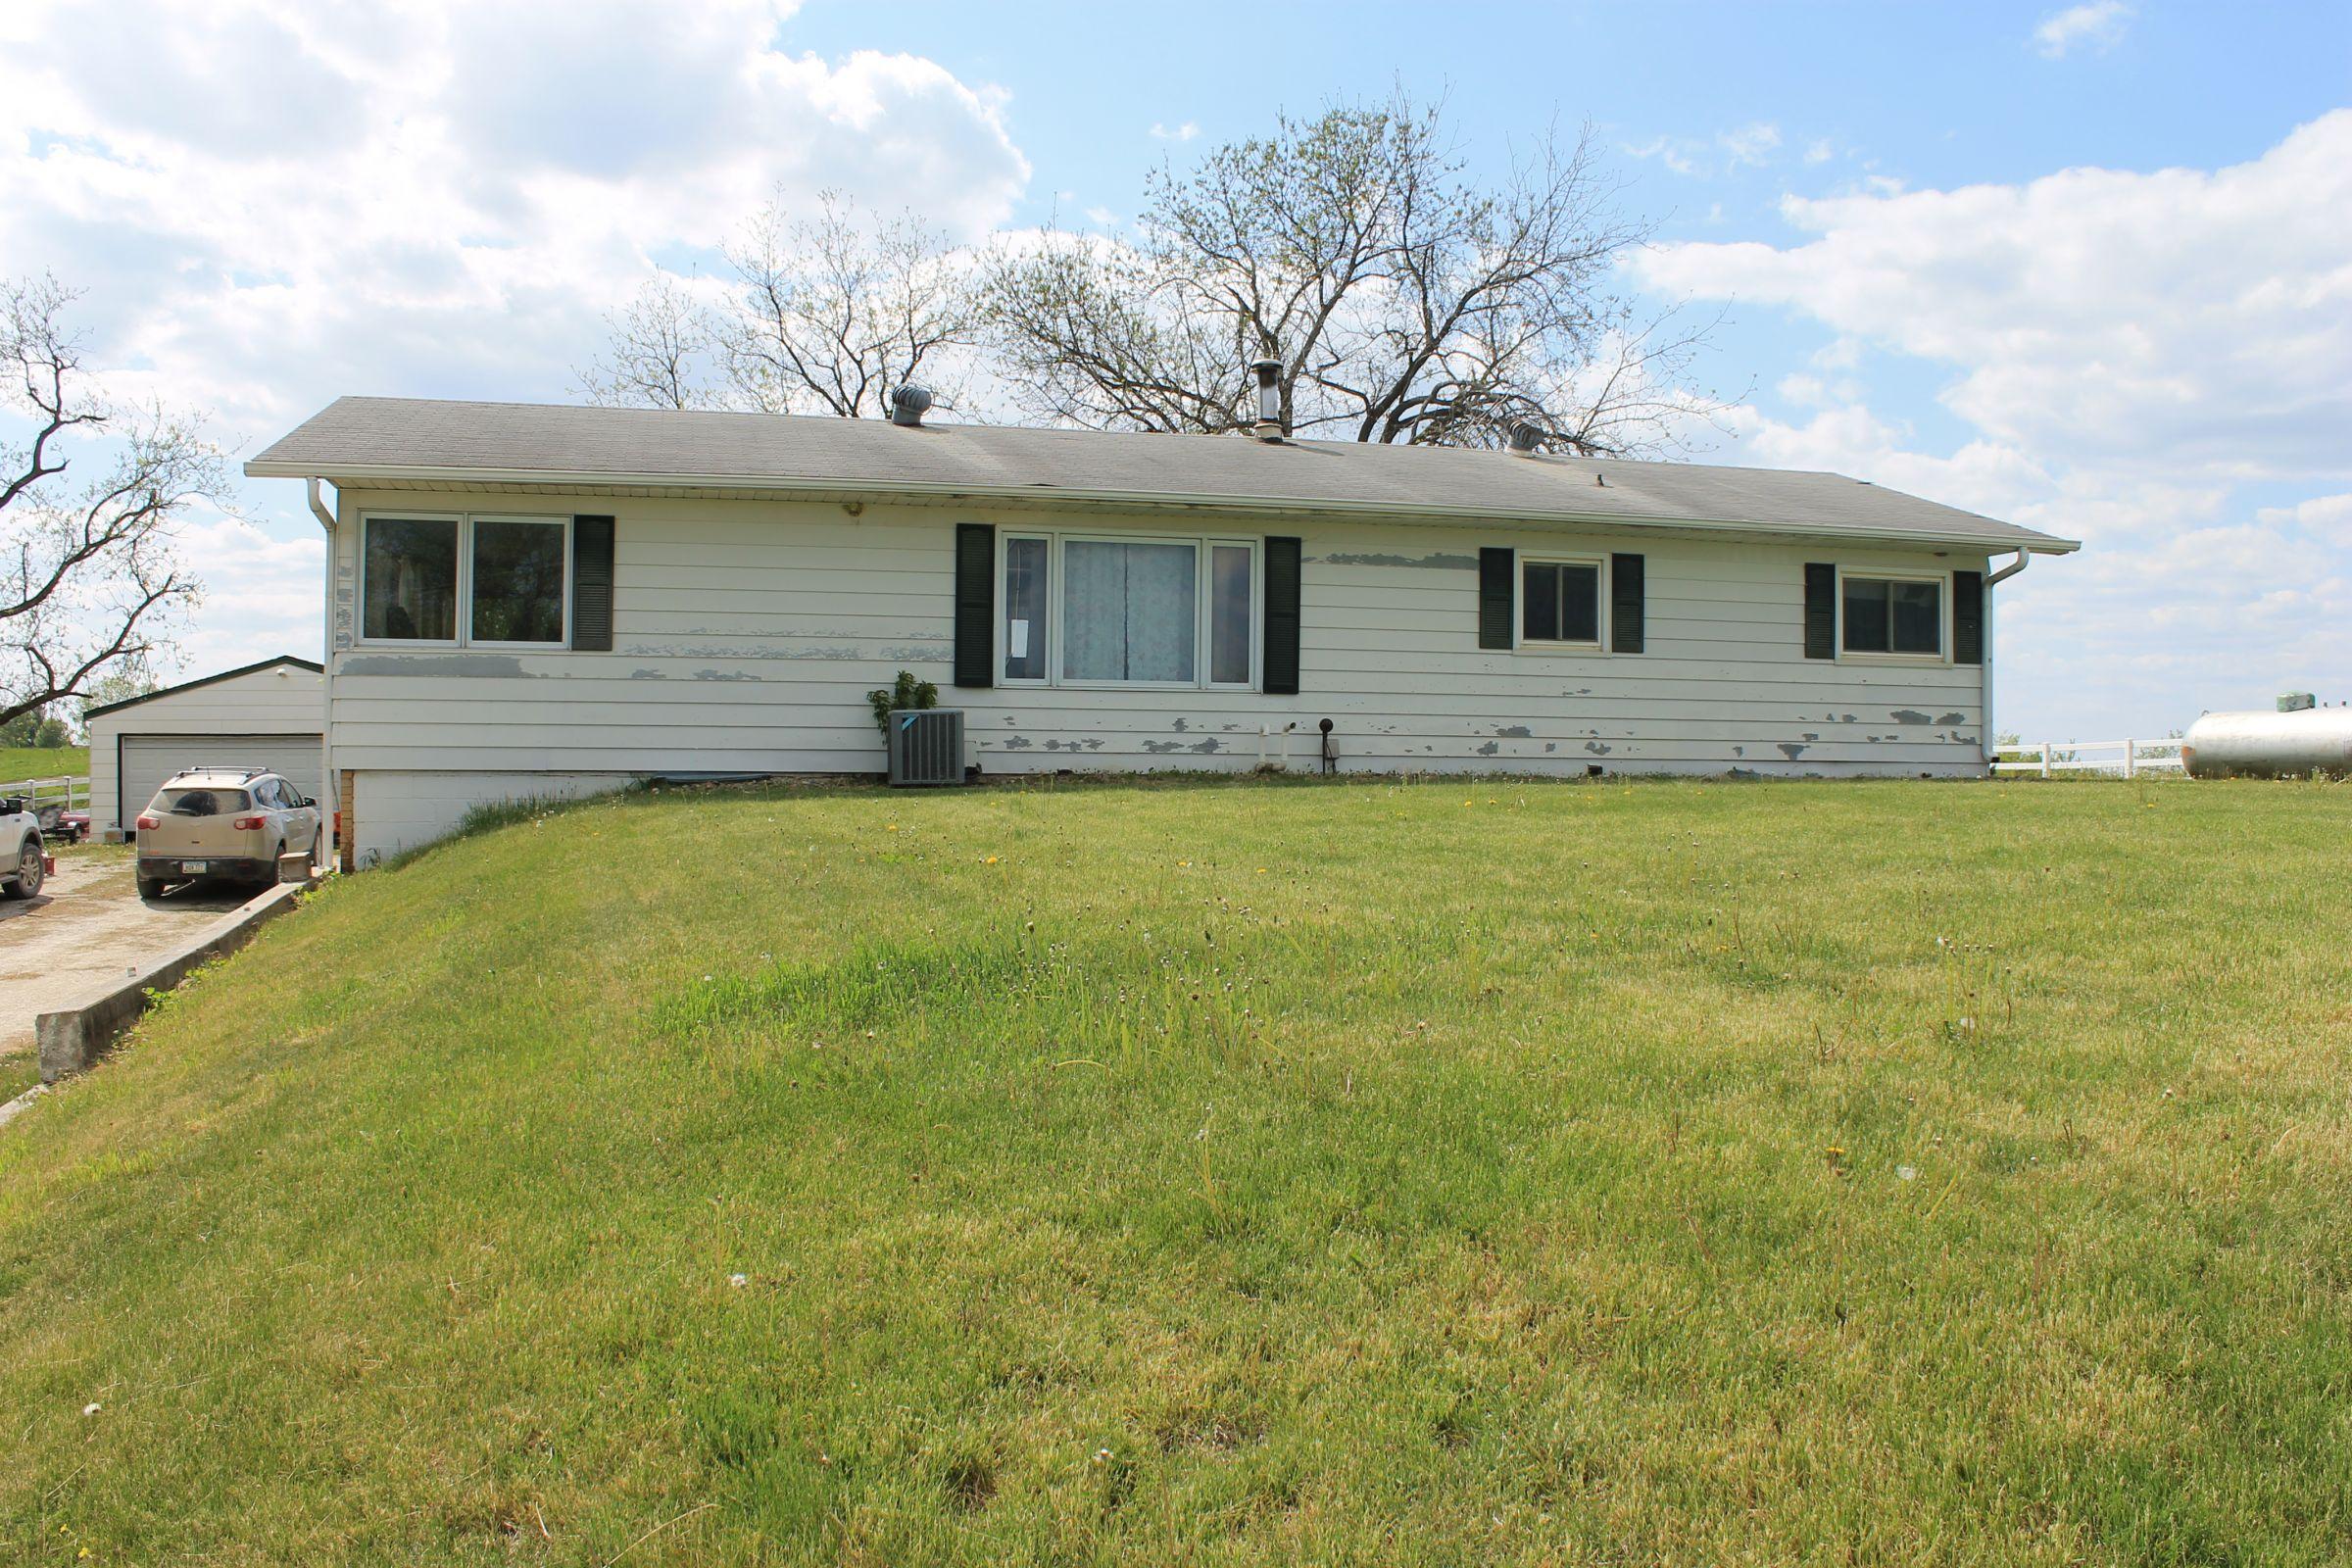 residential-development-land-warren-county-iowa-38-acres-listing-number-15513-13-2021-05-06-210446.JPG